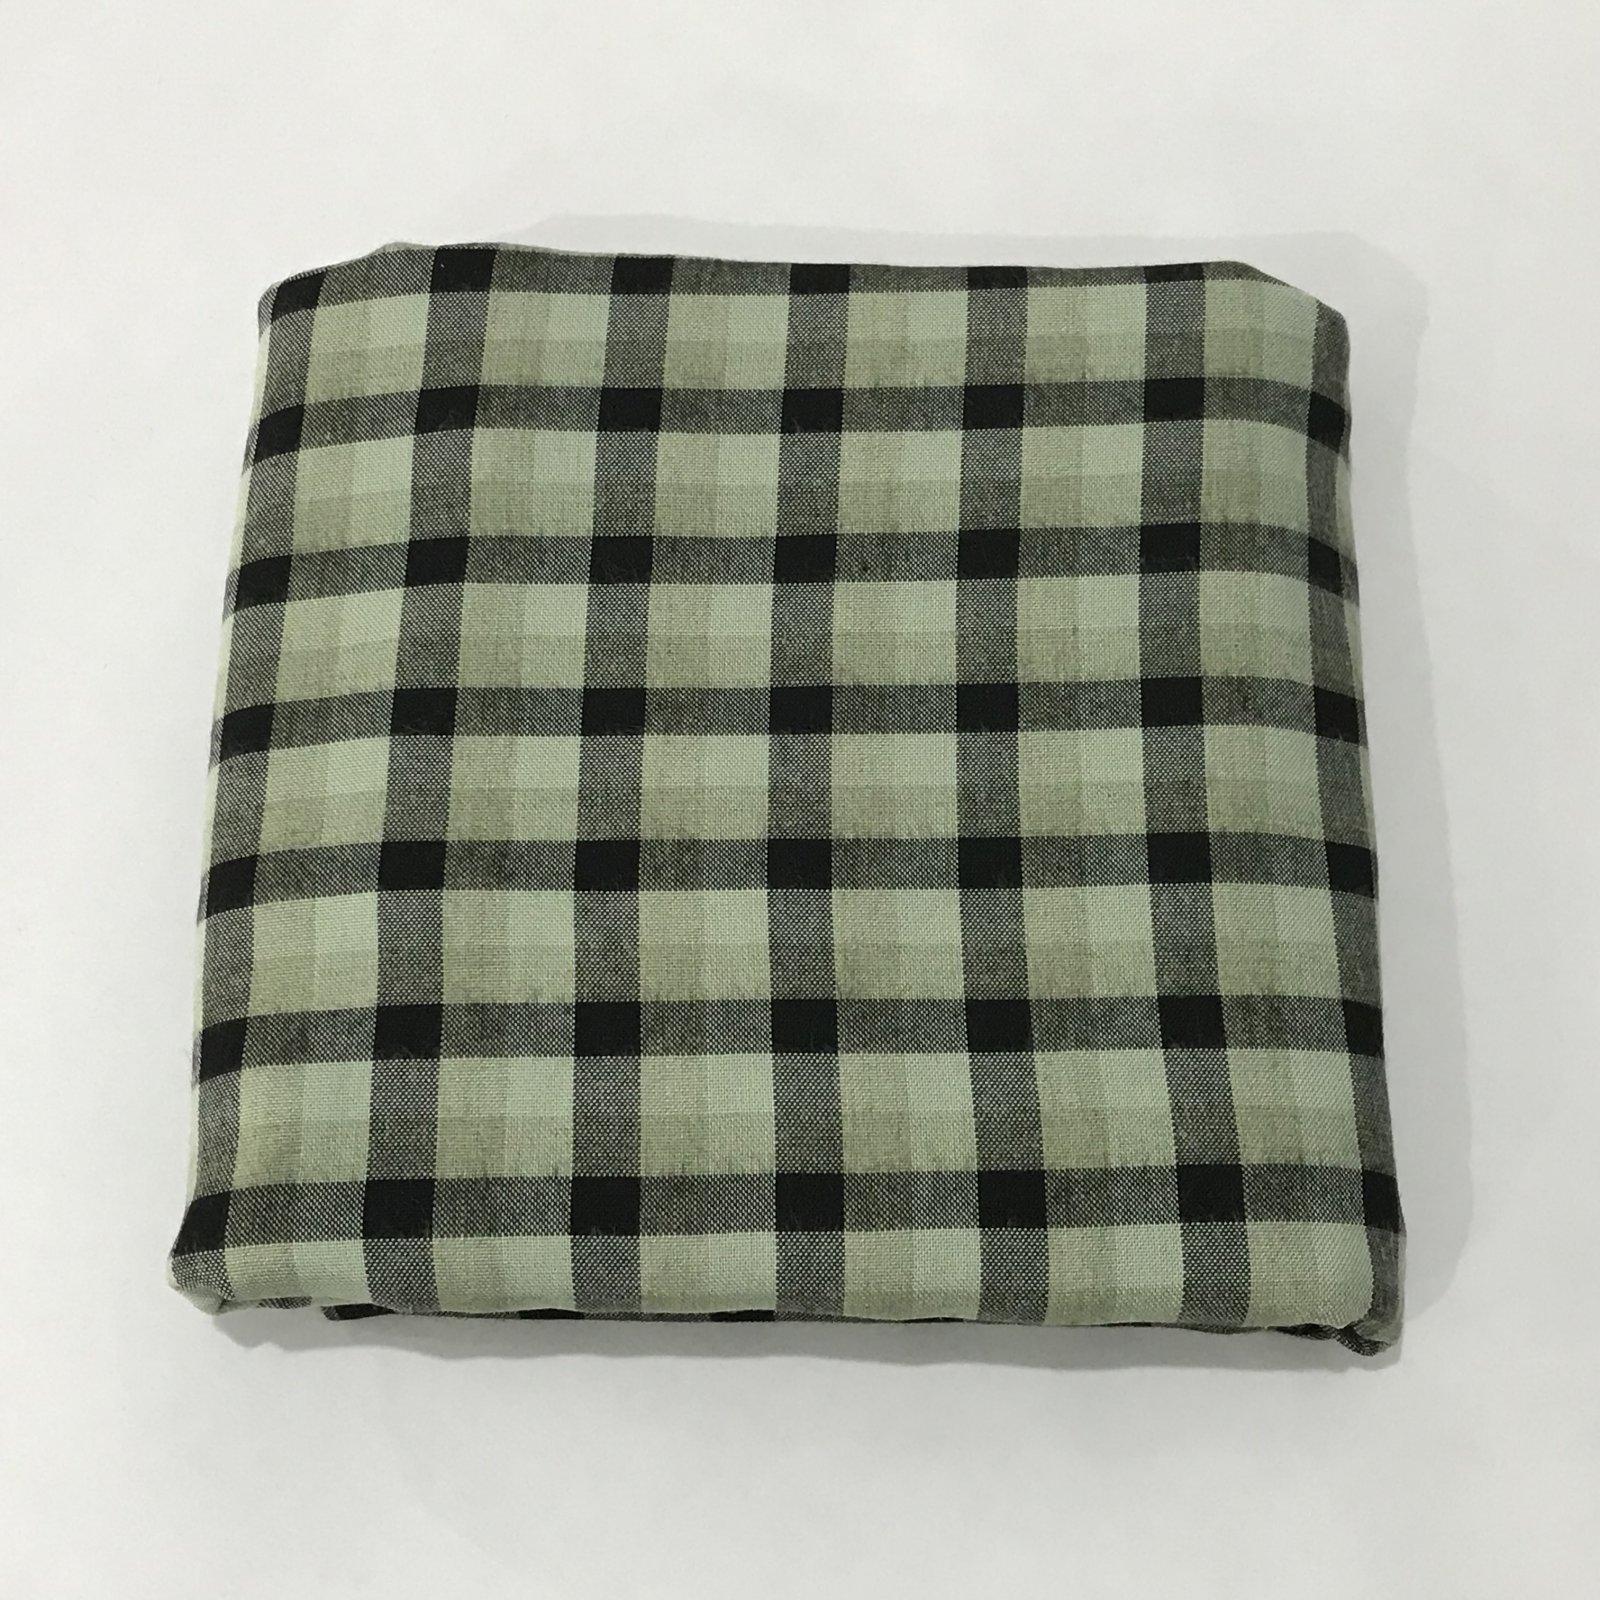 Linen/Cotton - Green & Black Plaid - 3 yards